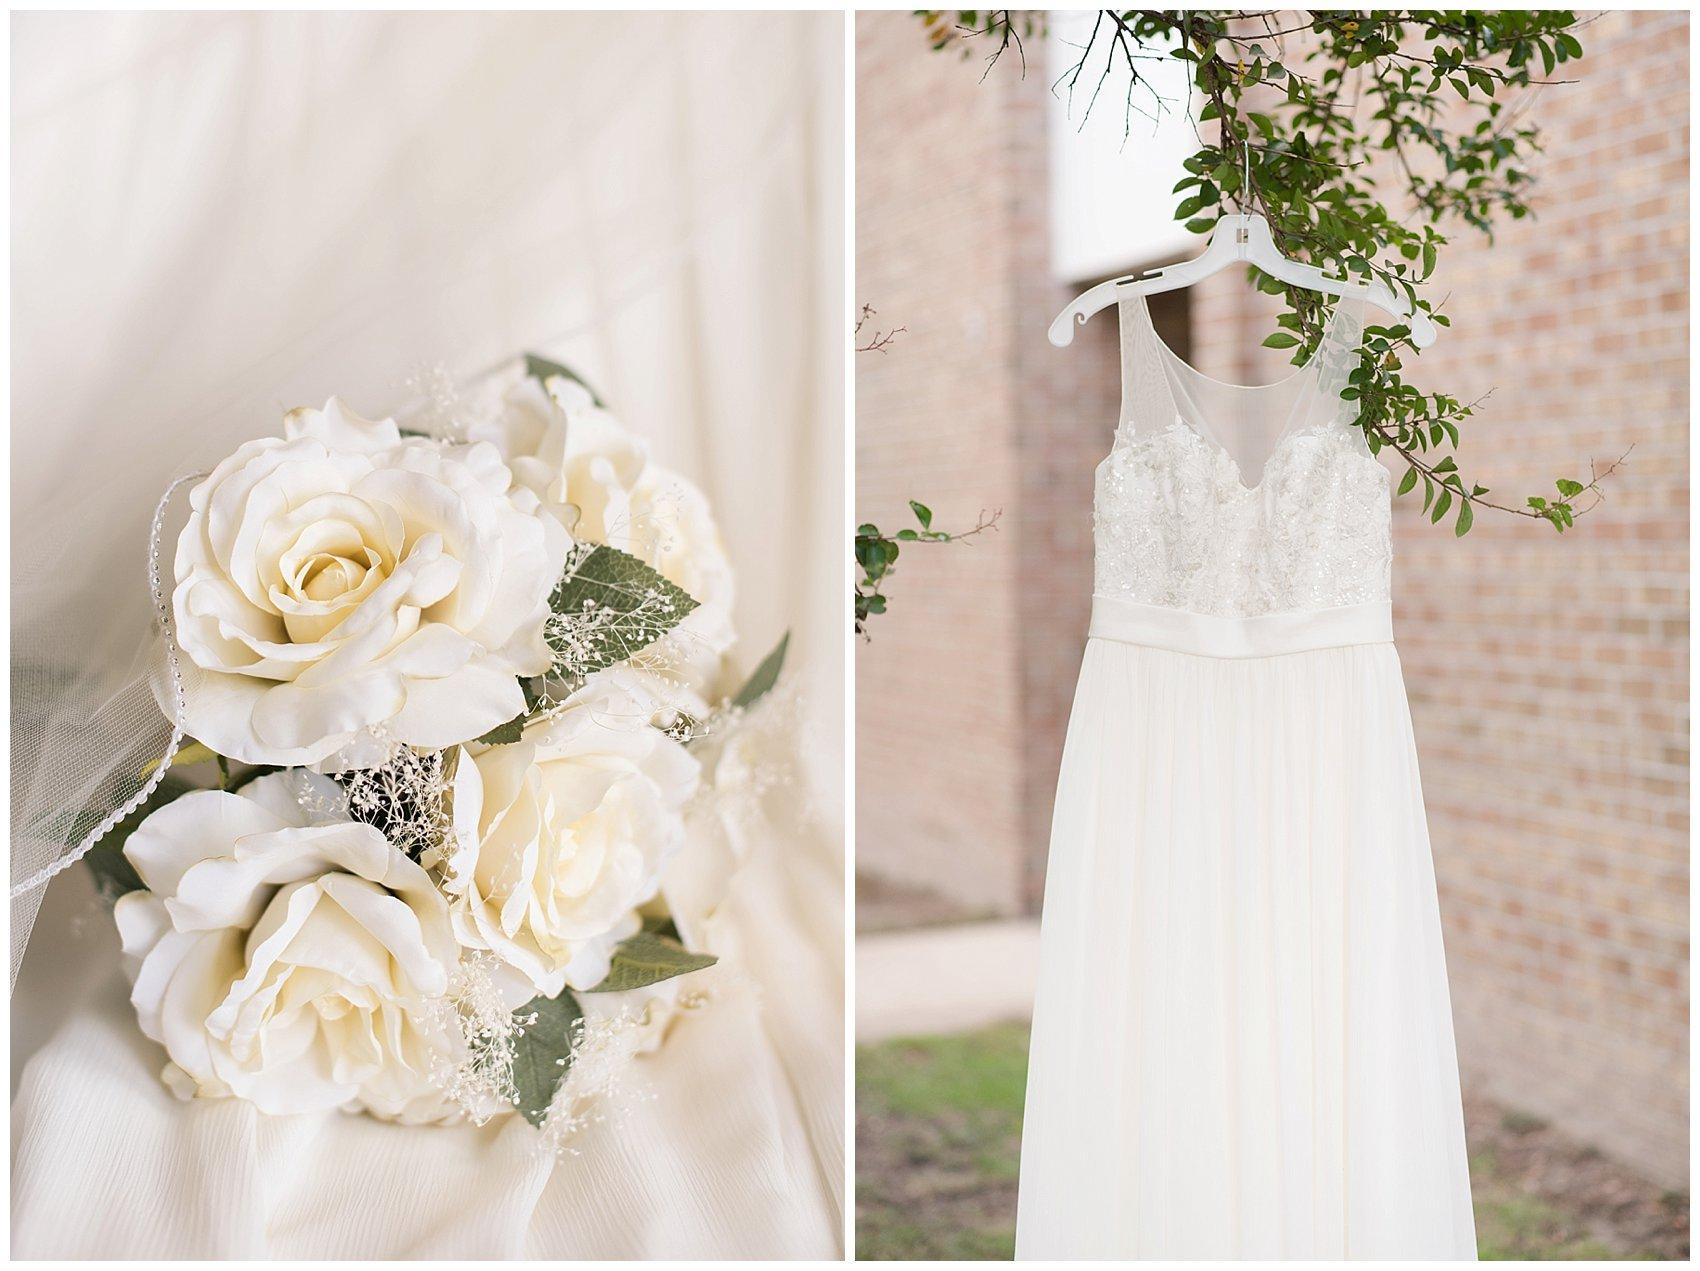 Blush Pink Summer Virginia Beach Wedding Regent University Founders Inn Bride and Groom Wedding Photographers_6023